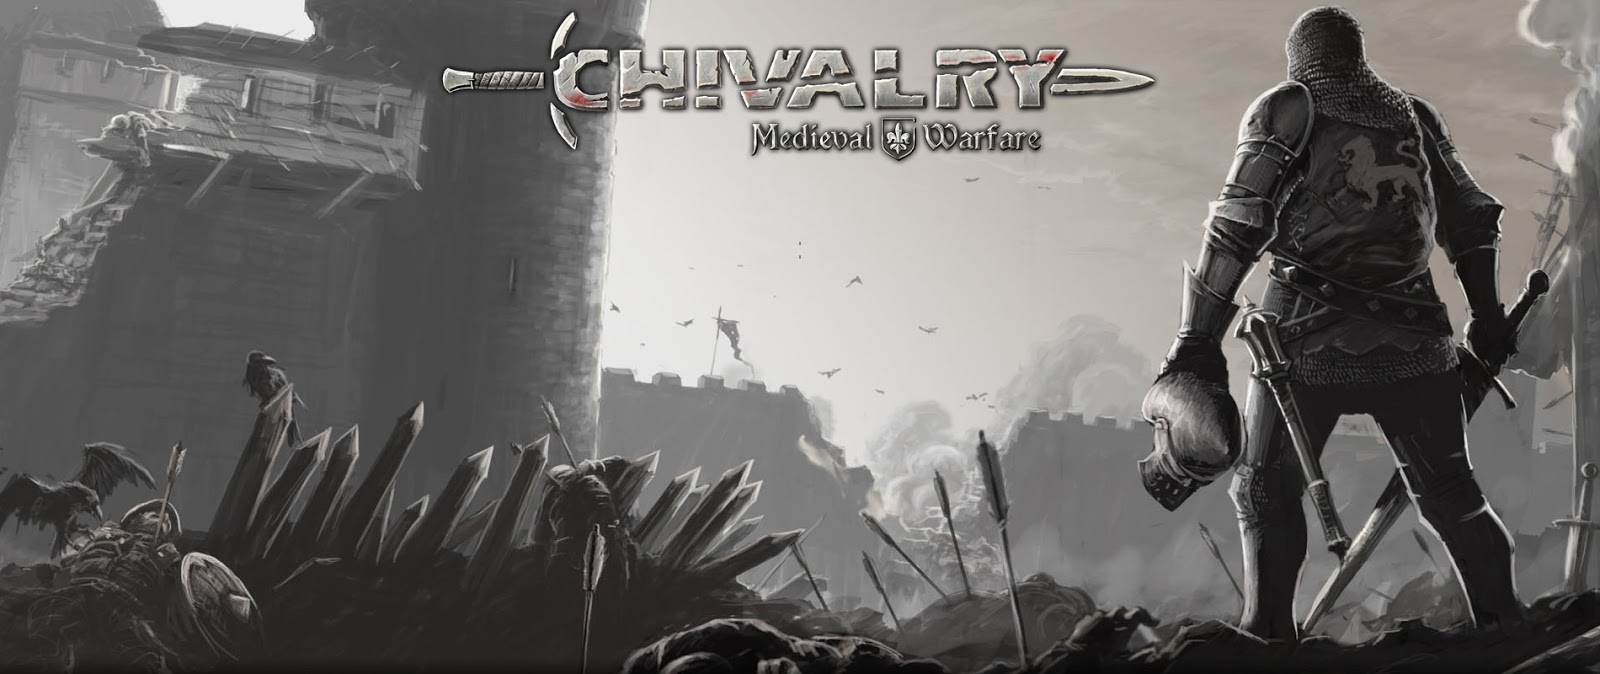 http://4.bp.blogspot.com/-jfA-To0rxBI/UH2oAniC-aI/AAAAAAAAHTg/K_Tb9ZhLeF4/s1600/Chivalry+Medieval+Warfare.jpg